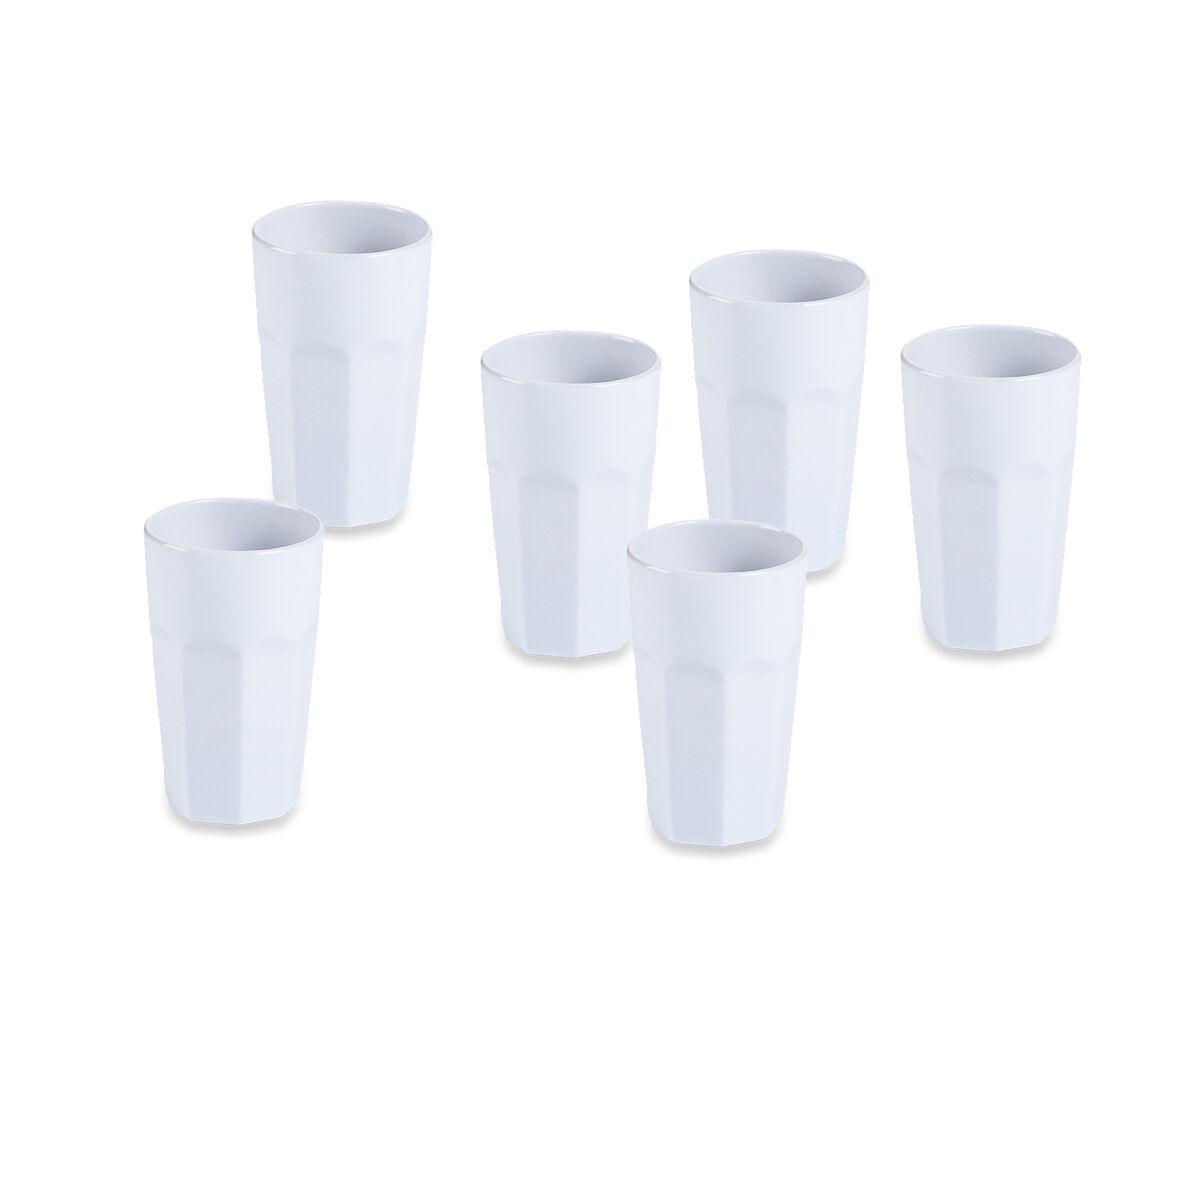 Latte Macchiato Becher 6 Stück Porzellan Weiß Ca 360 Ml